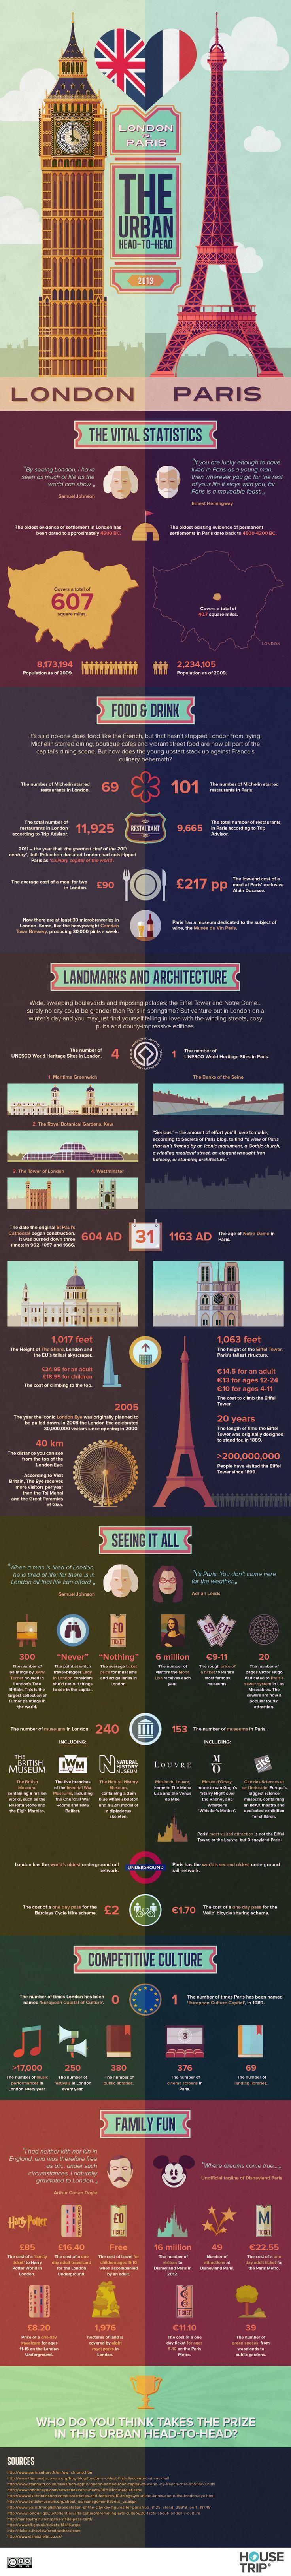 London Vs Paris: Two Cities Go Head-To-Head #europe #citytrip #travel #tips